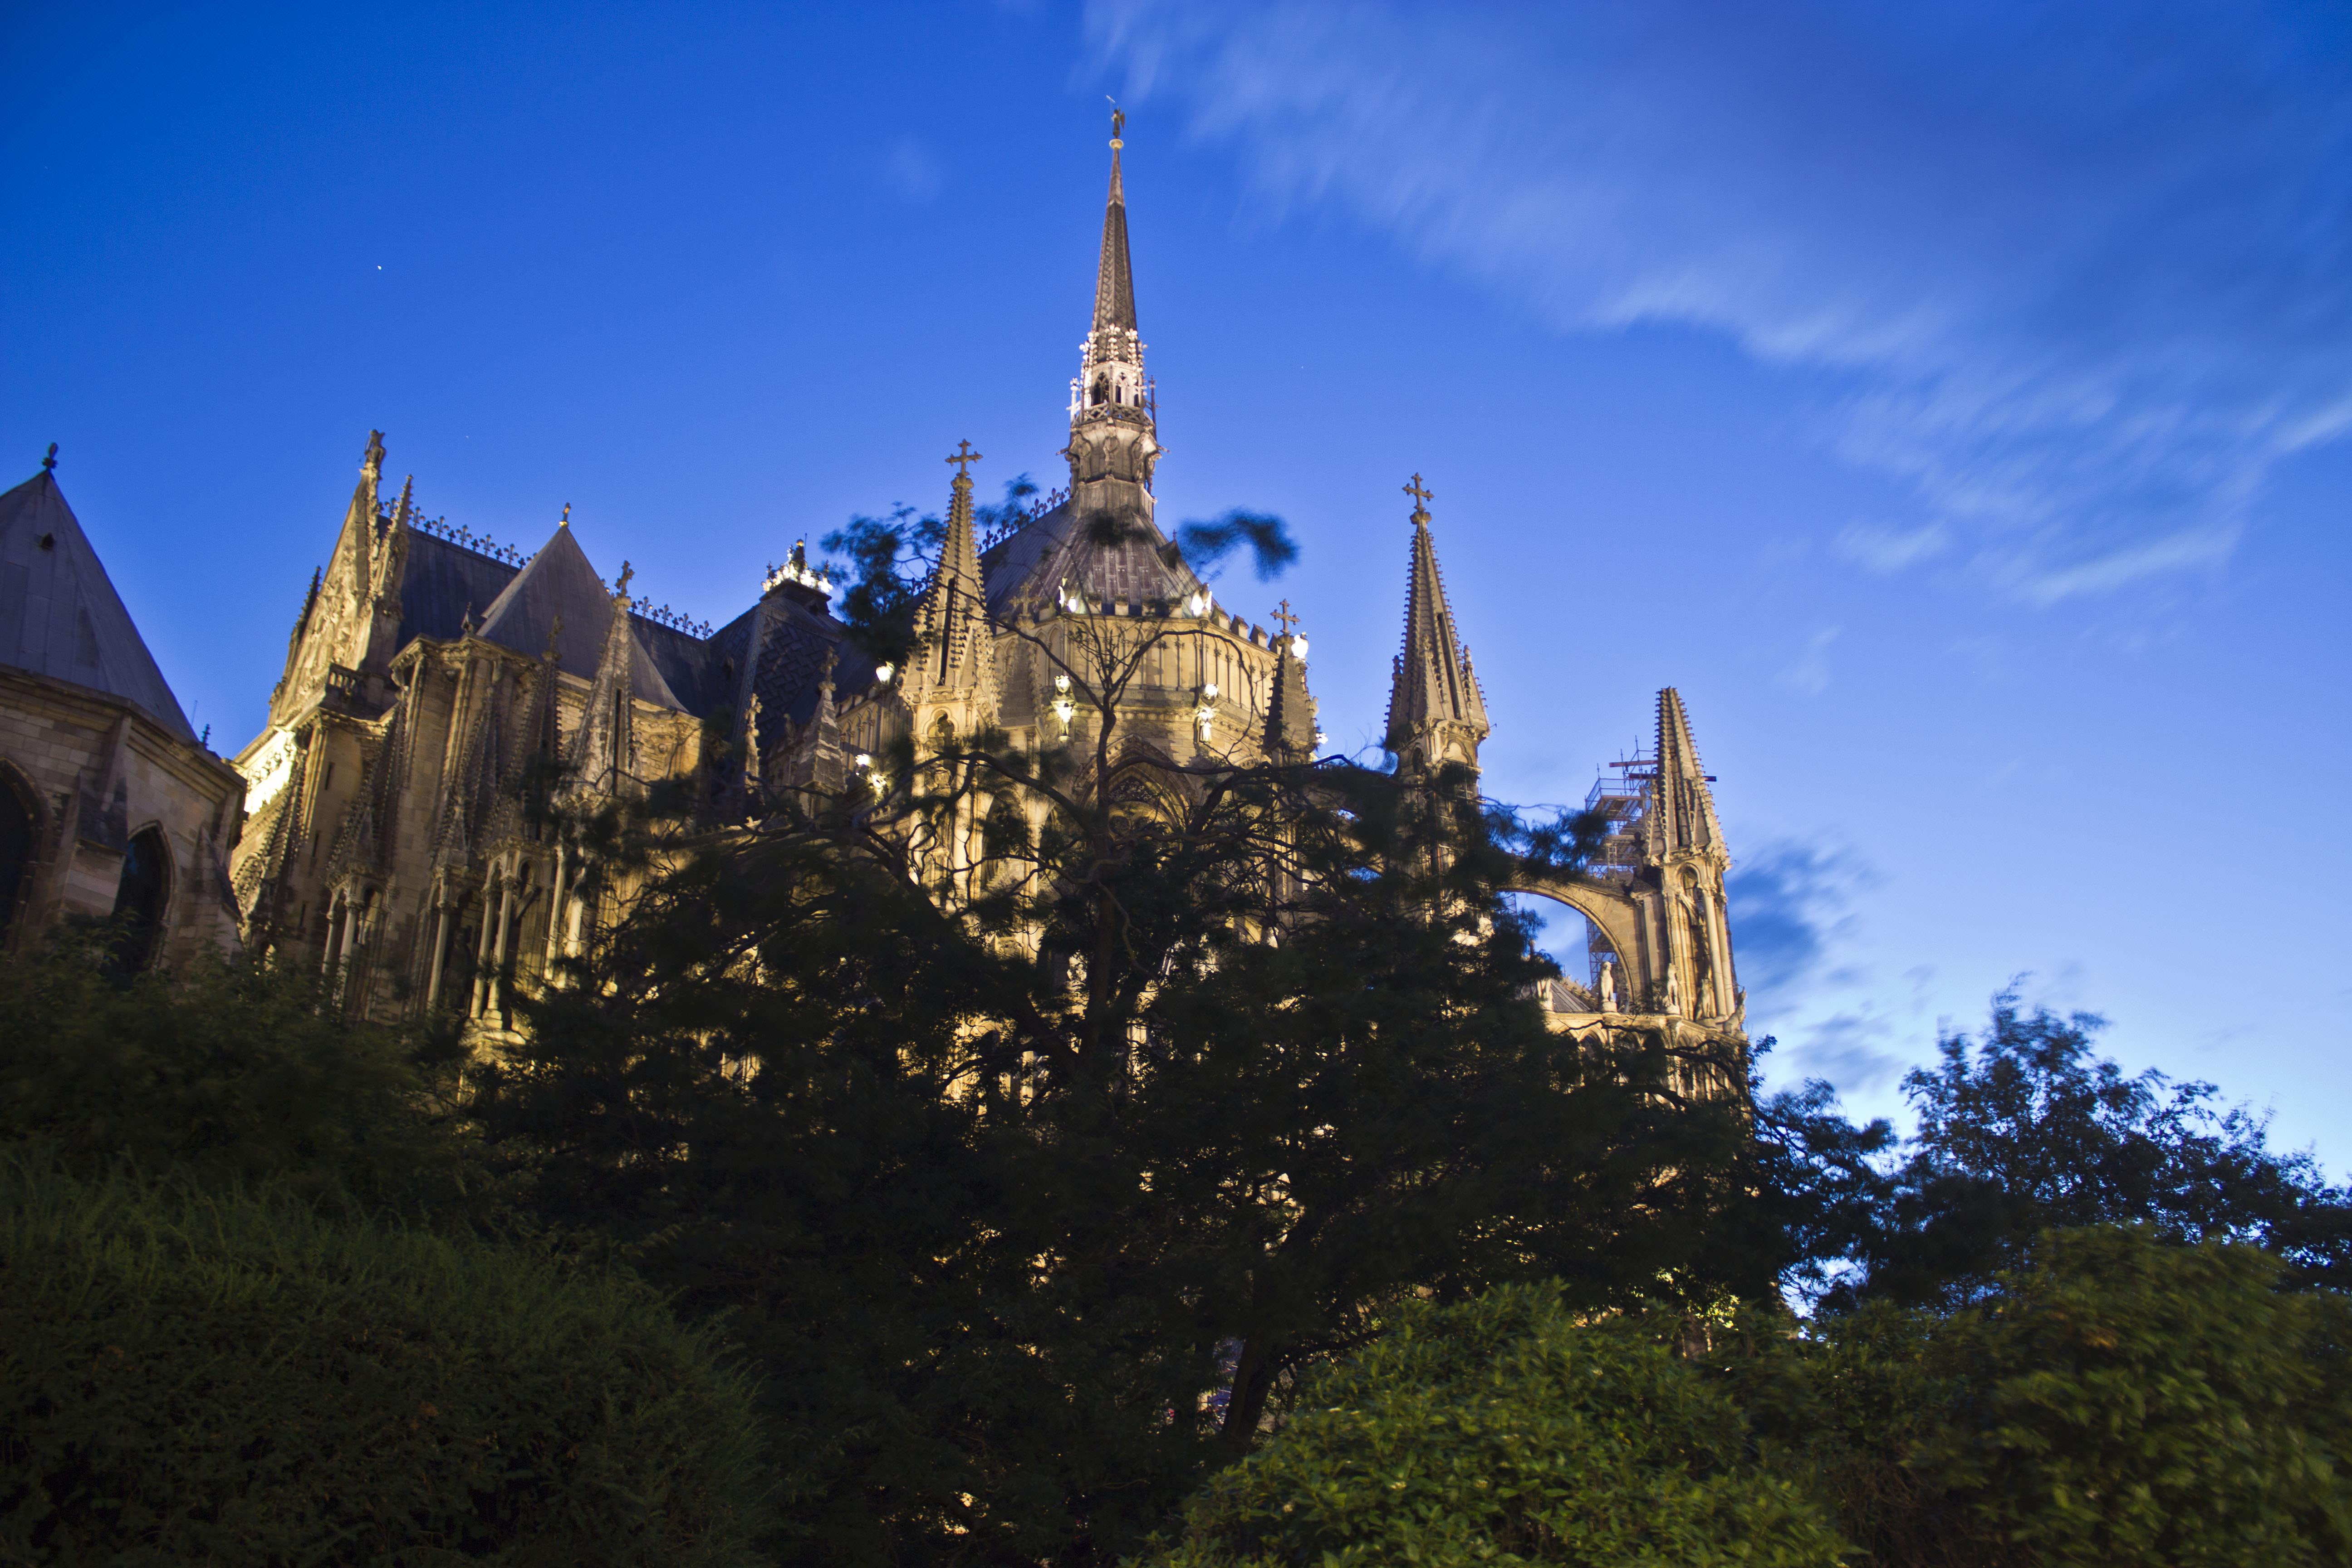 https://cdt51.media.tourinsoft.eu/upload/Cathedrale-Notre-Dame-de-Reims---Carmen-Moya--4-.JPG